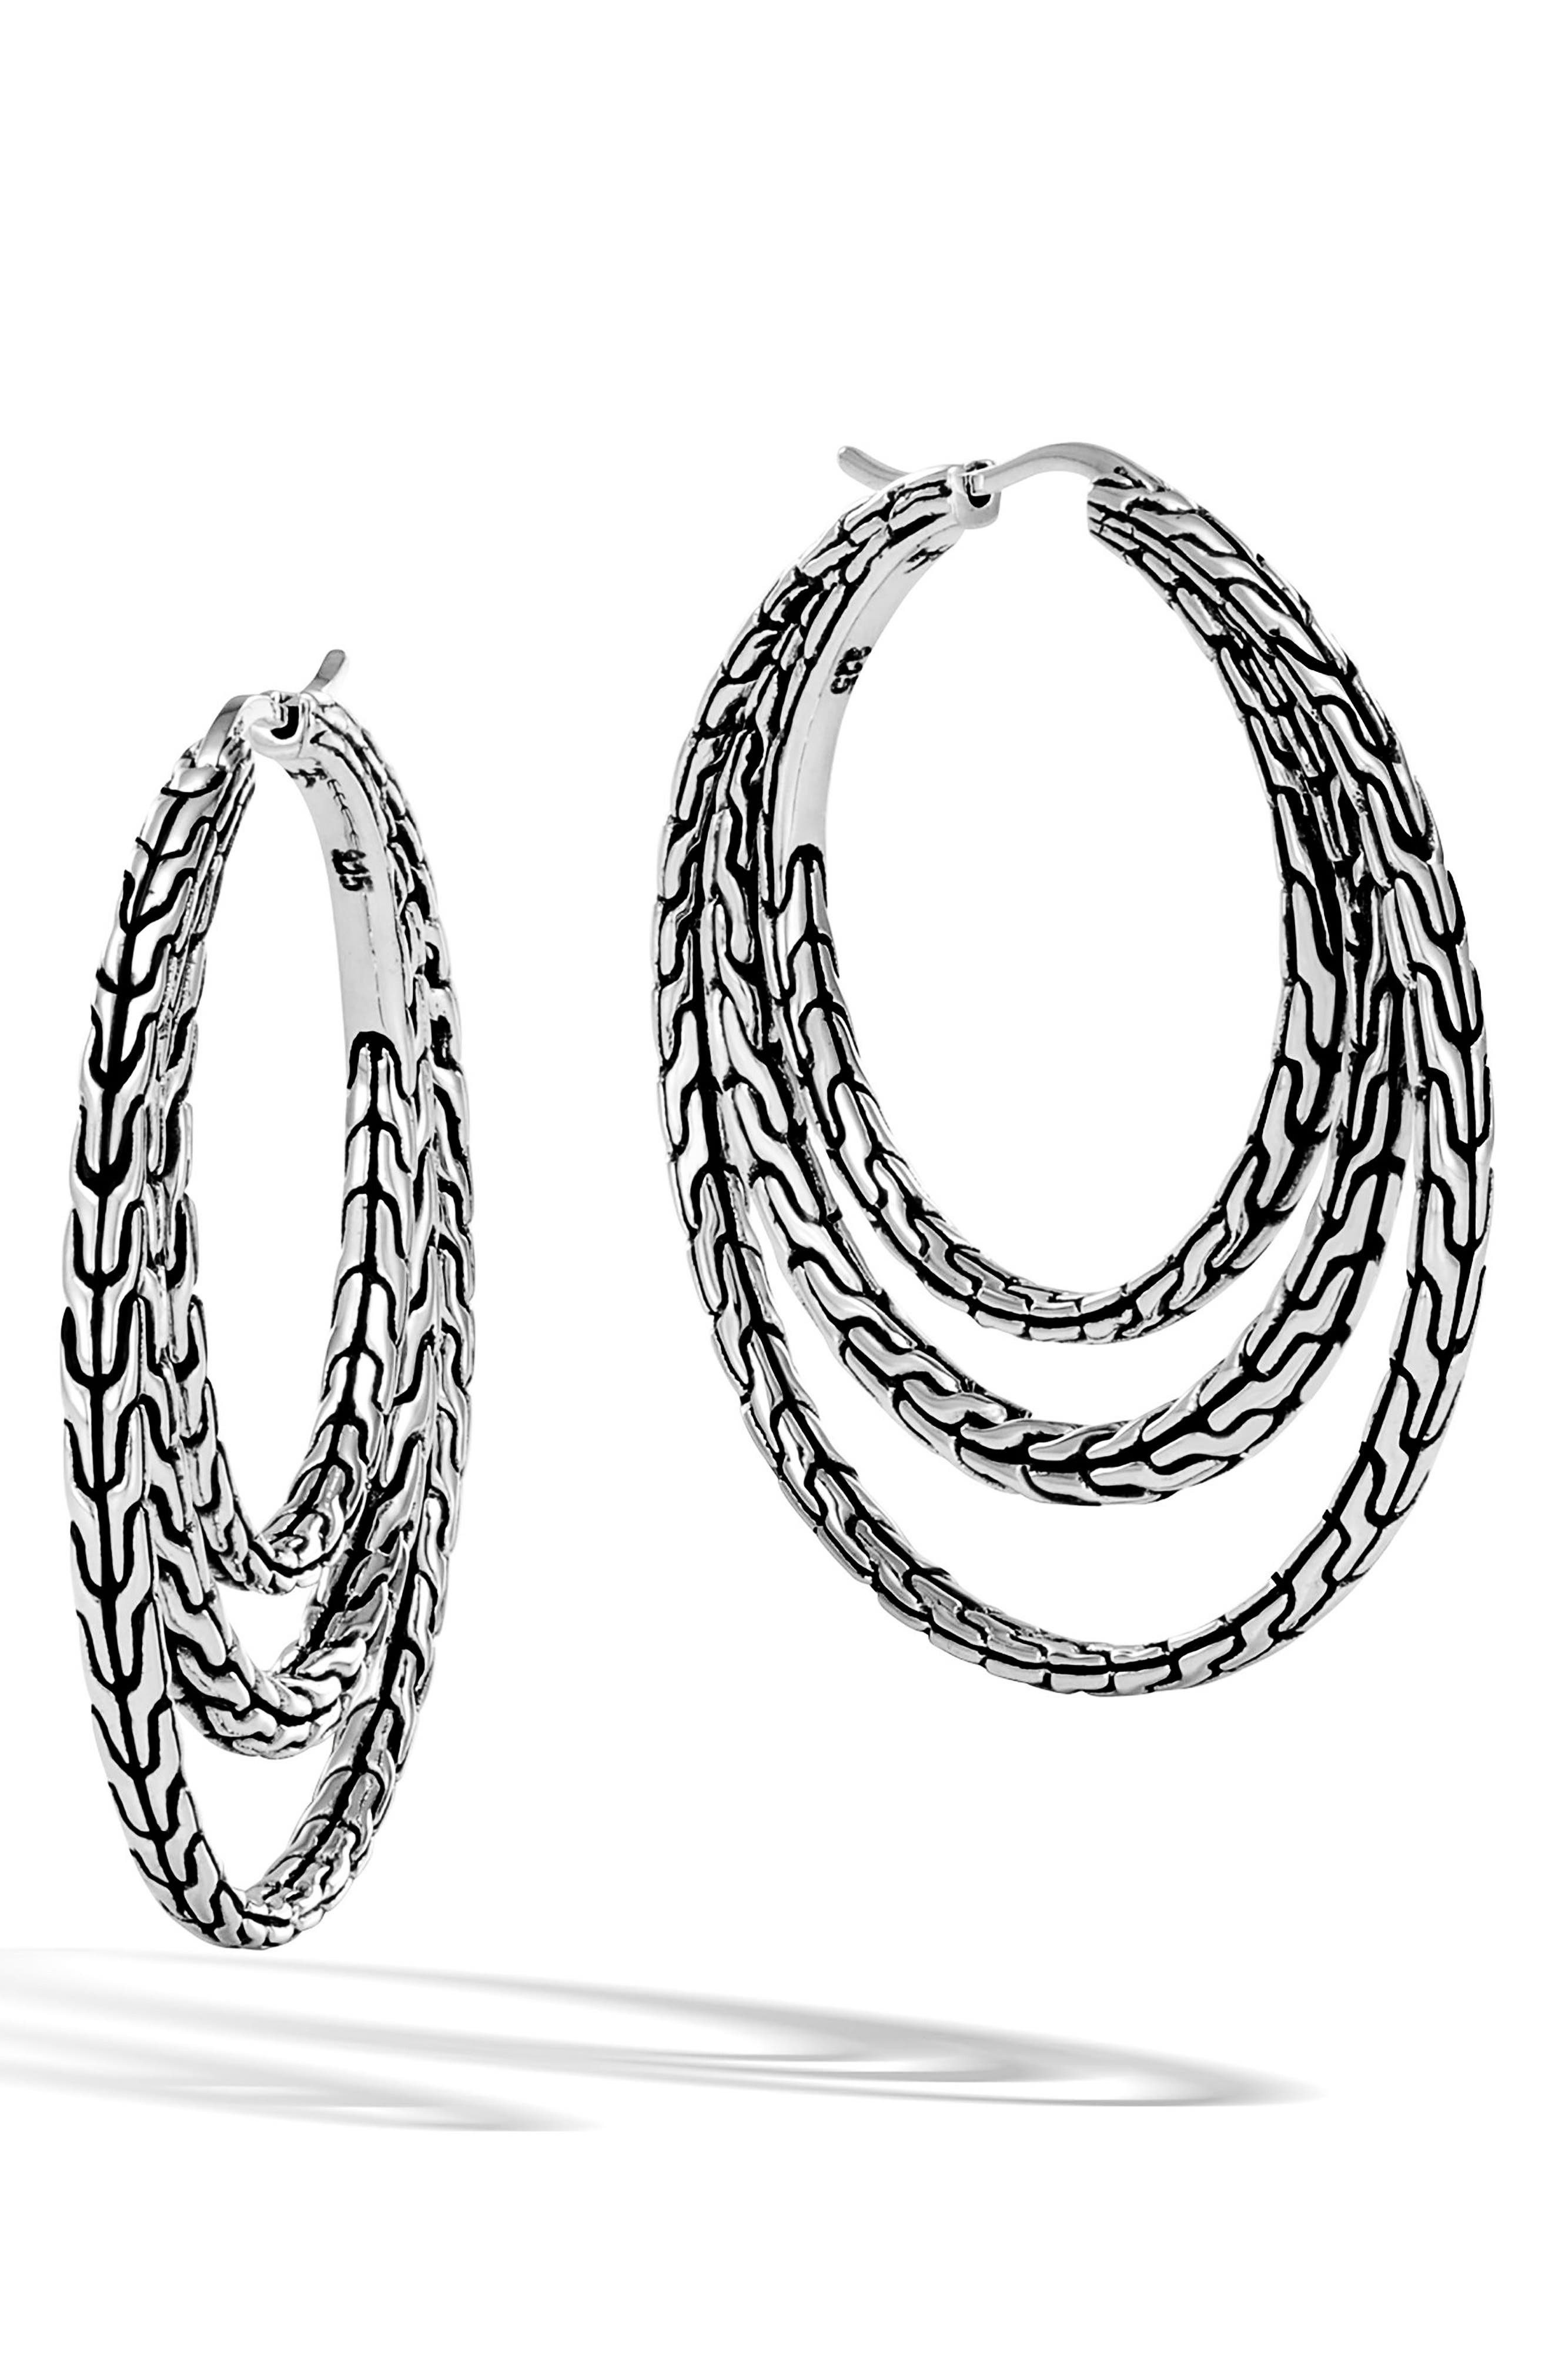 Alternate Image 1 Selected - John Hardy Classic Chain Medium Hoop Earrings